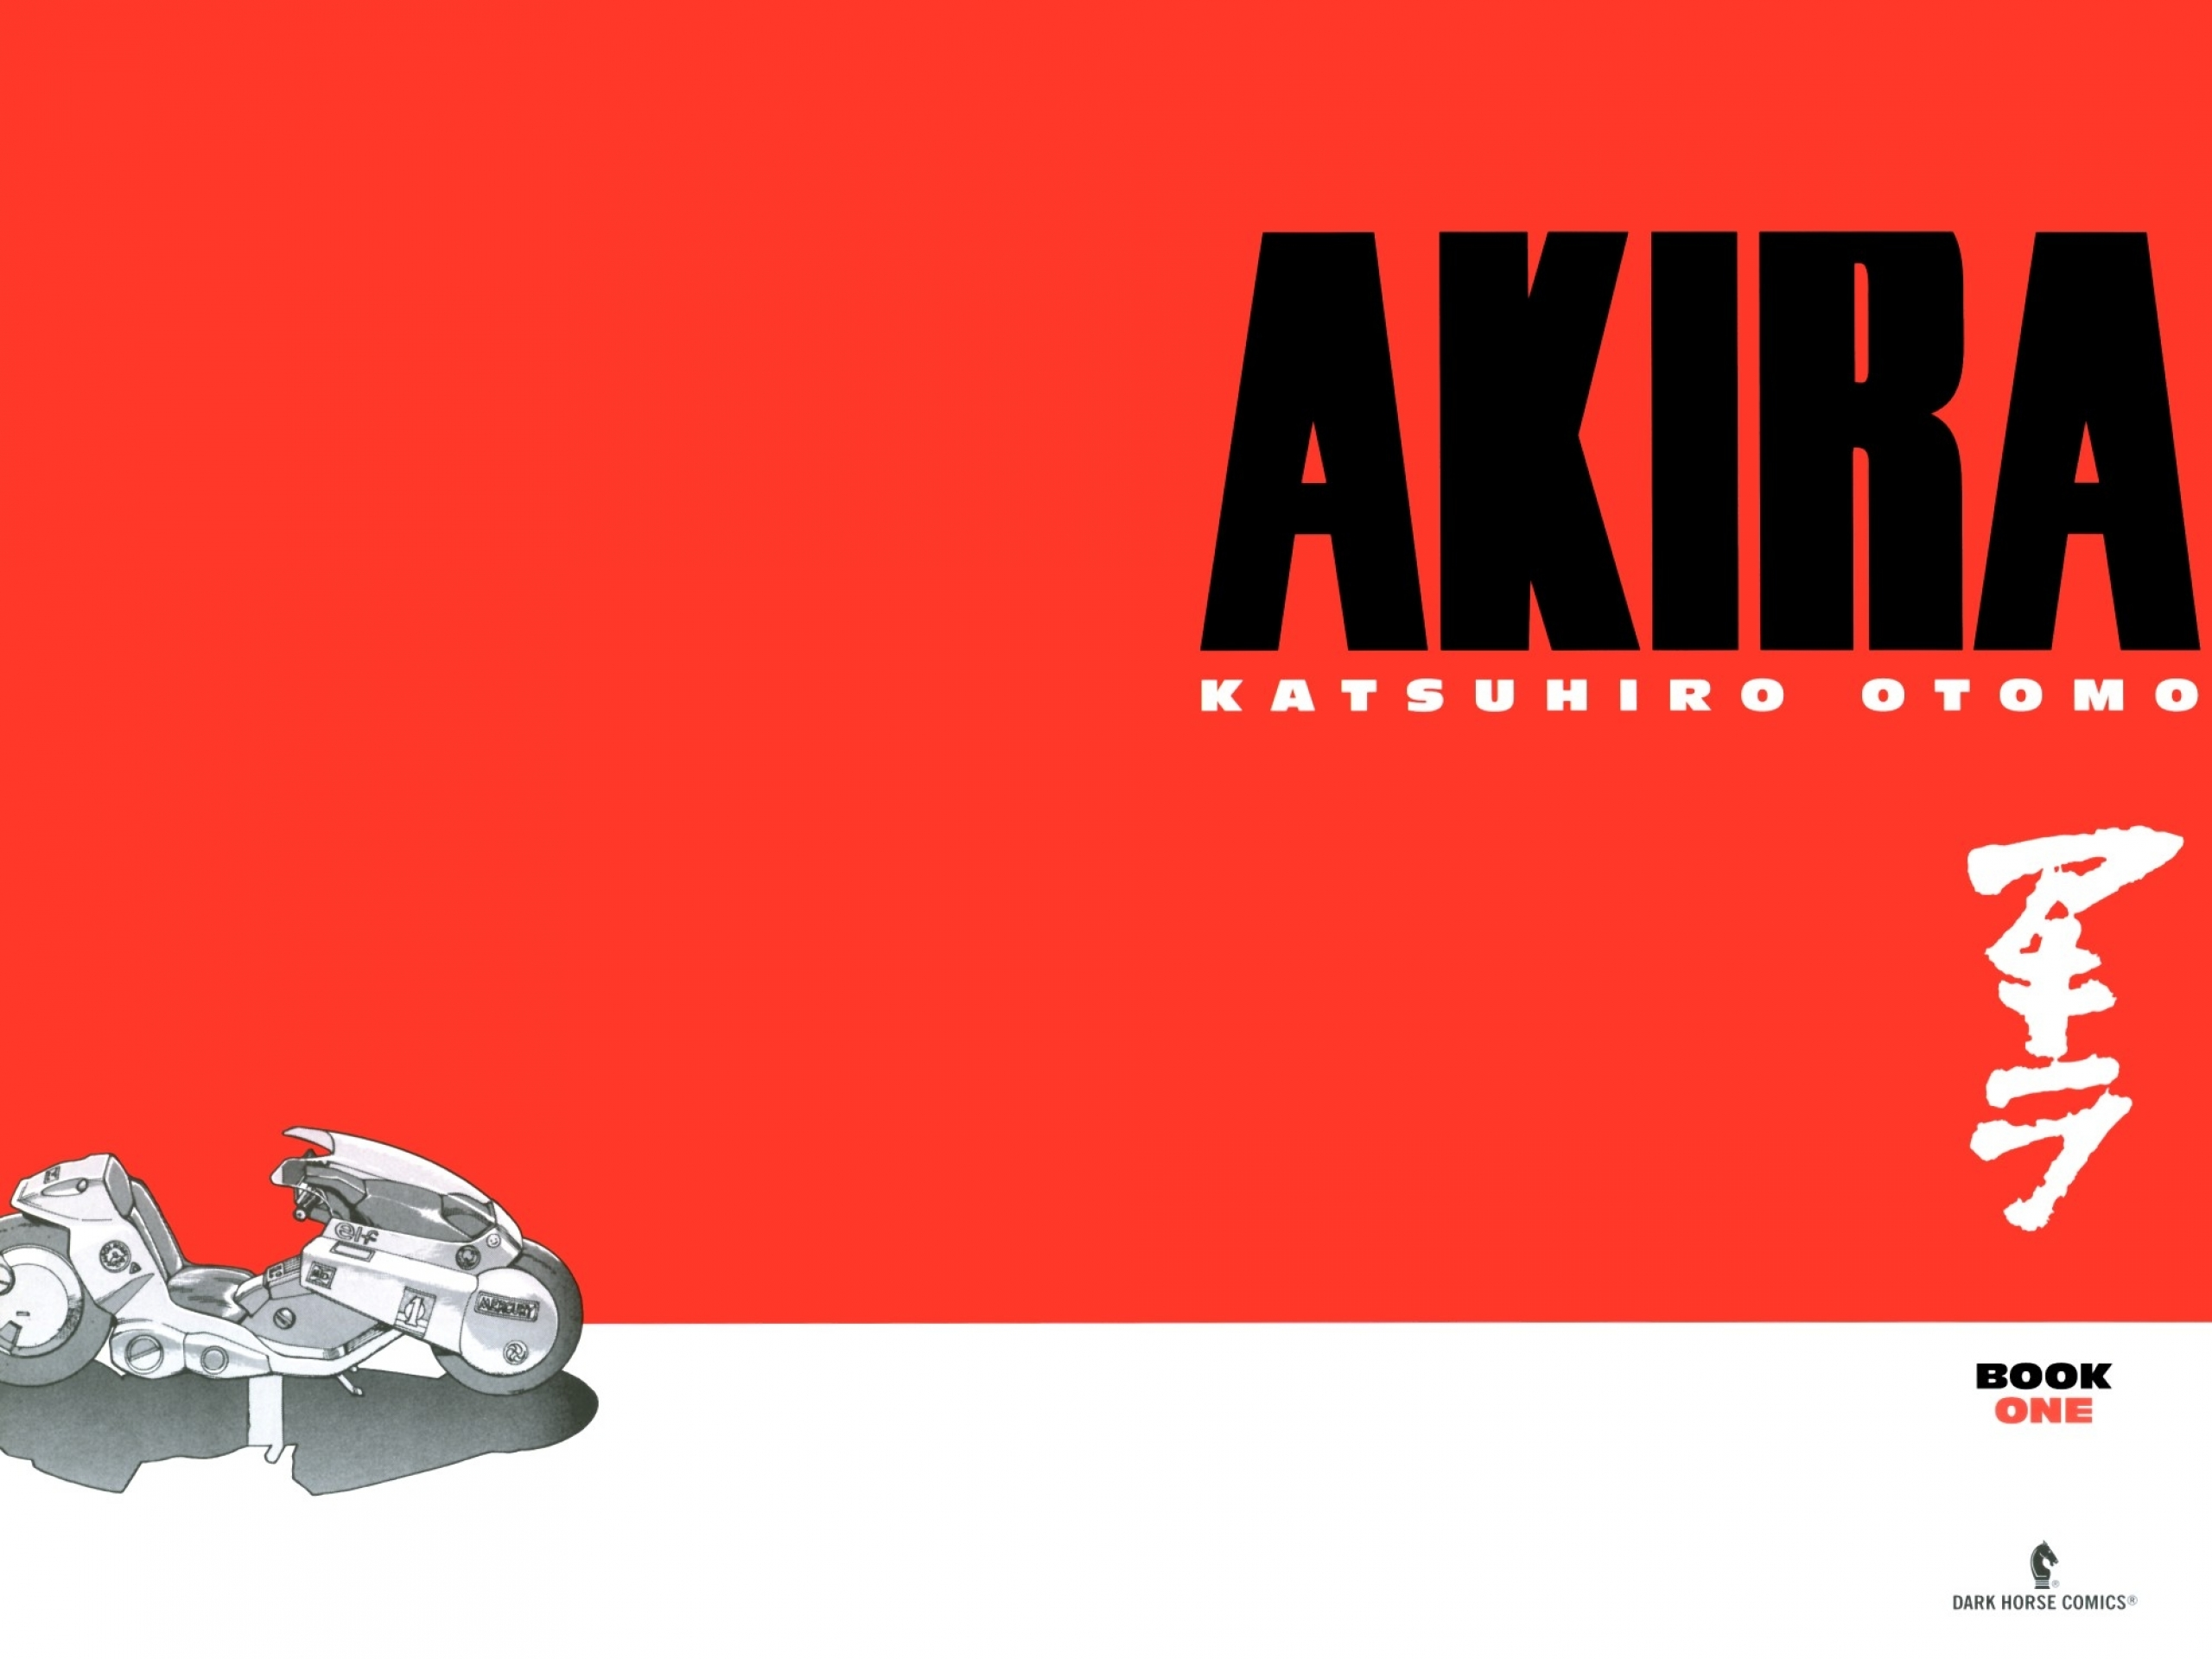 Akira Wallpaper Hd Posted By Ethan Peltier